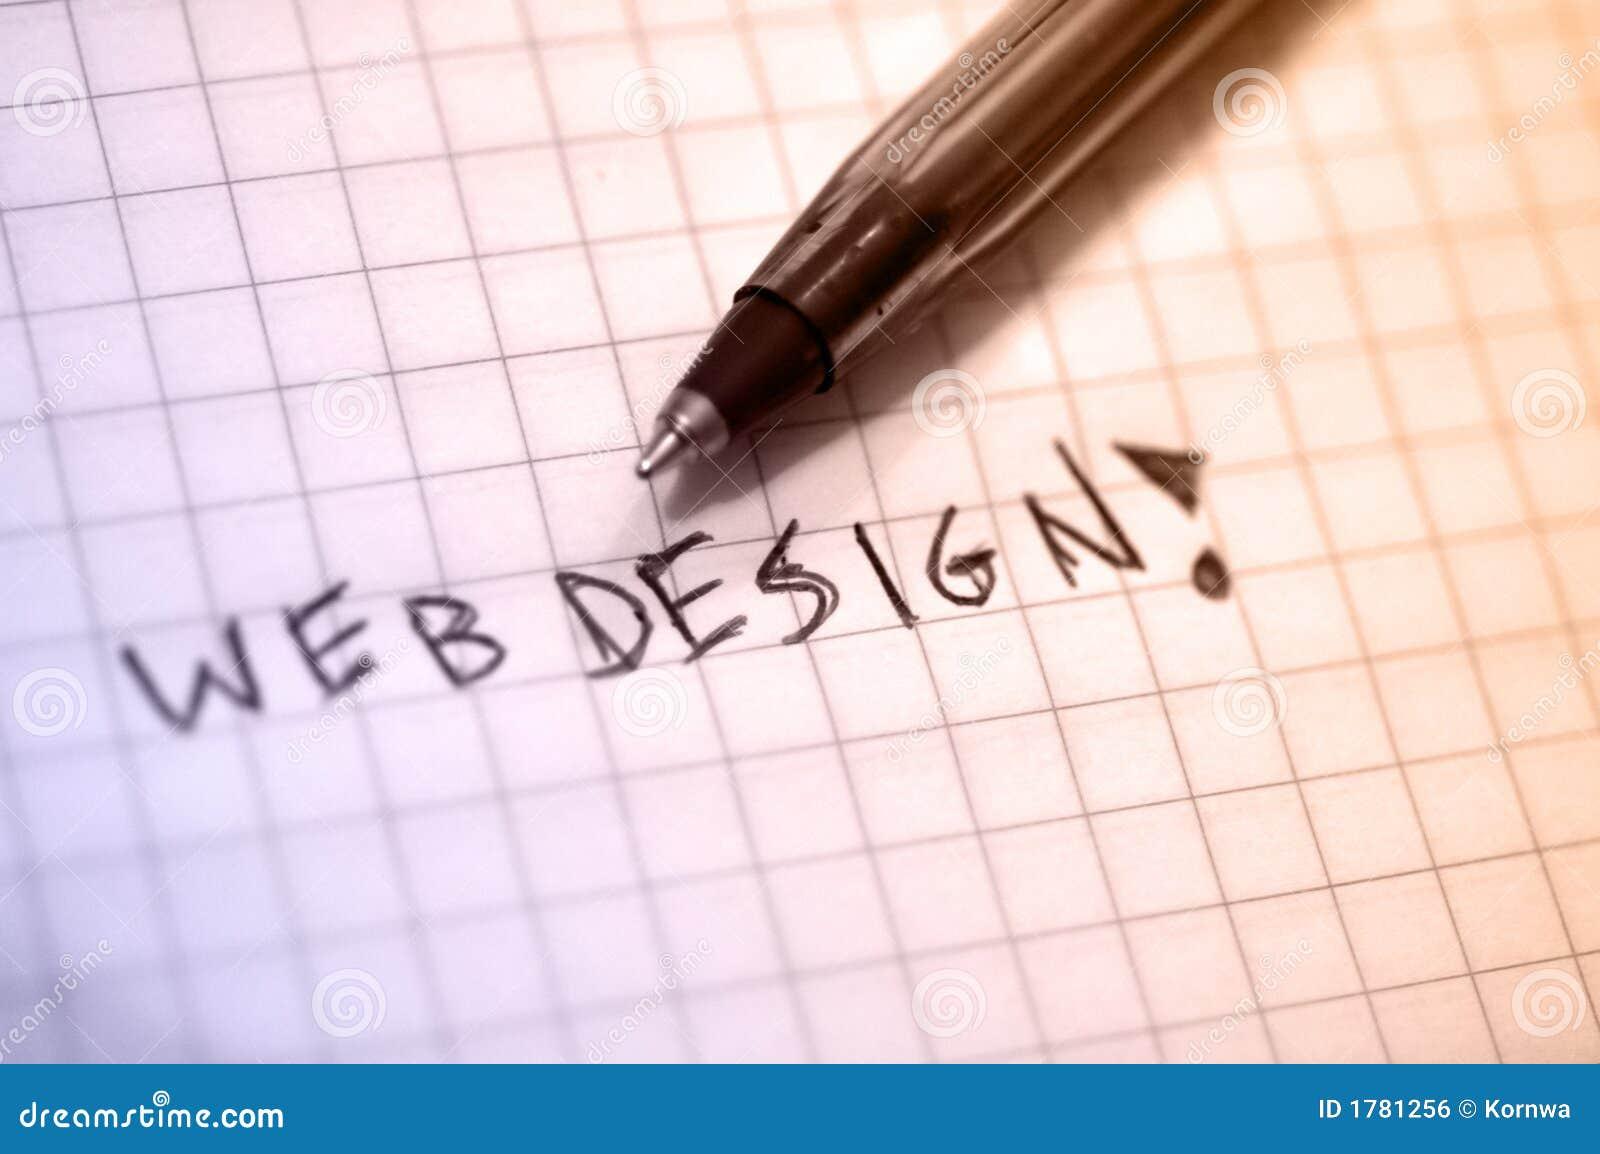 Web Design Royalty Free Stock Image - Image: 1781256